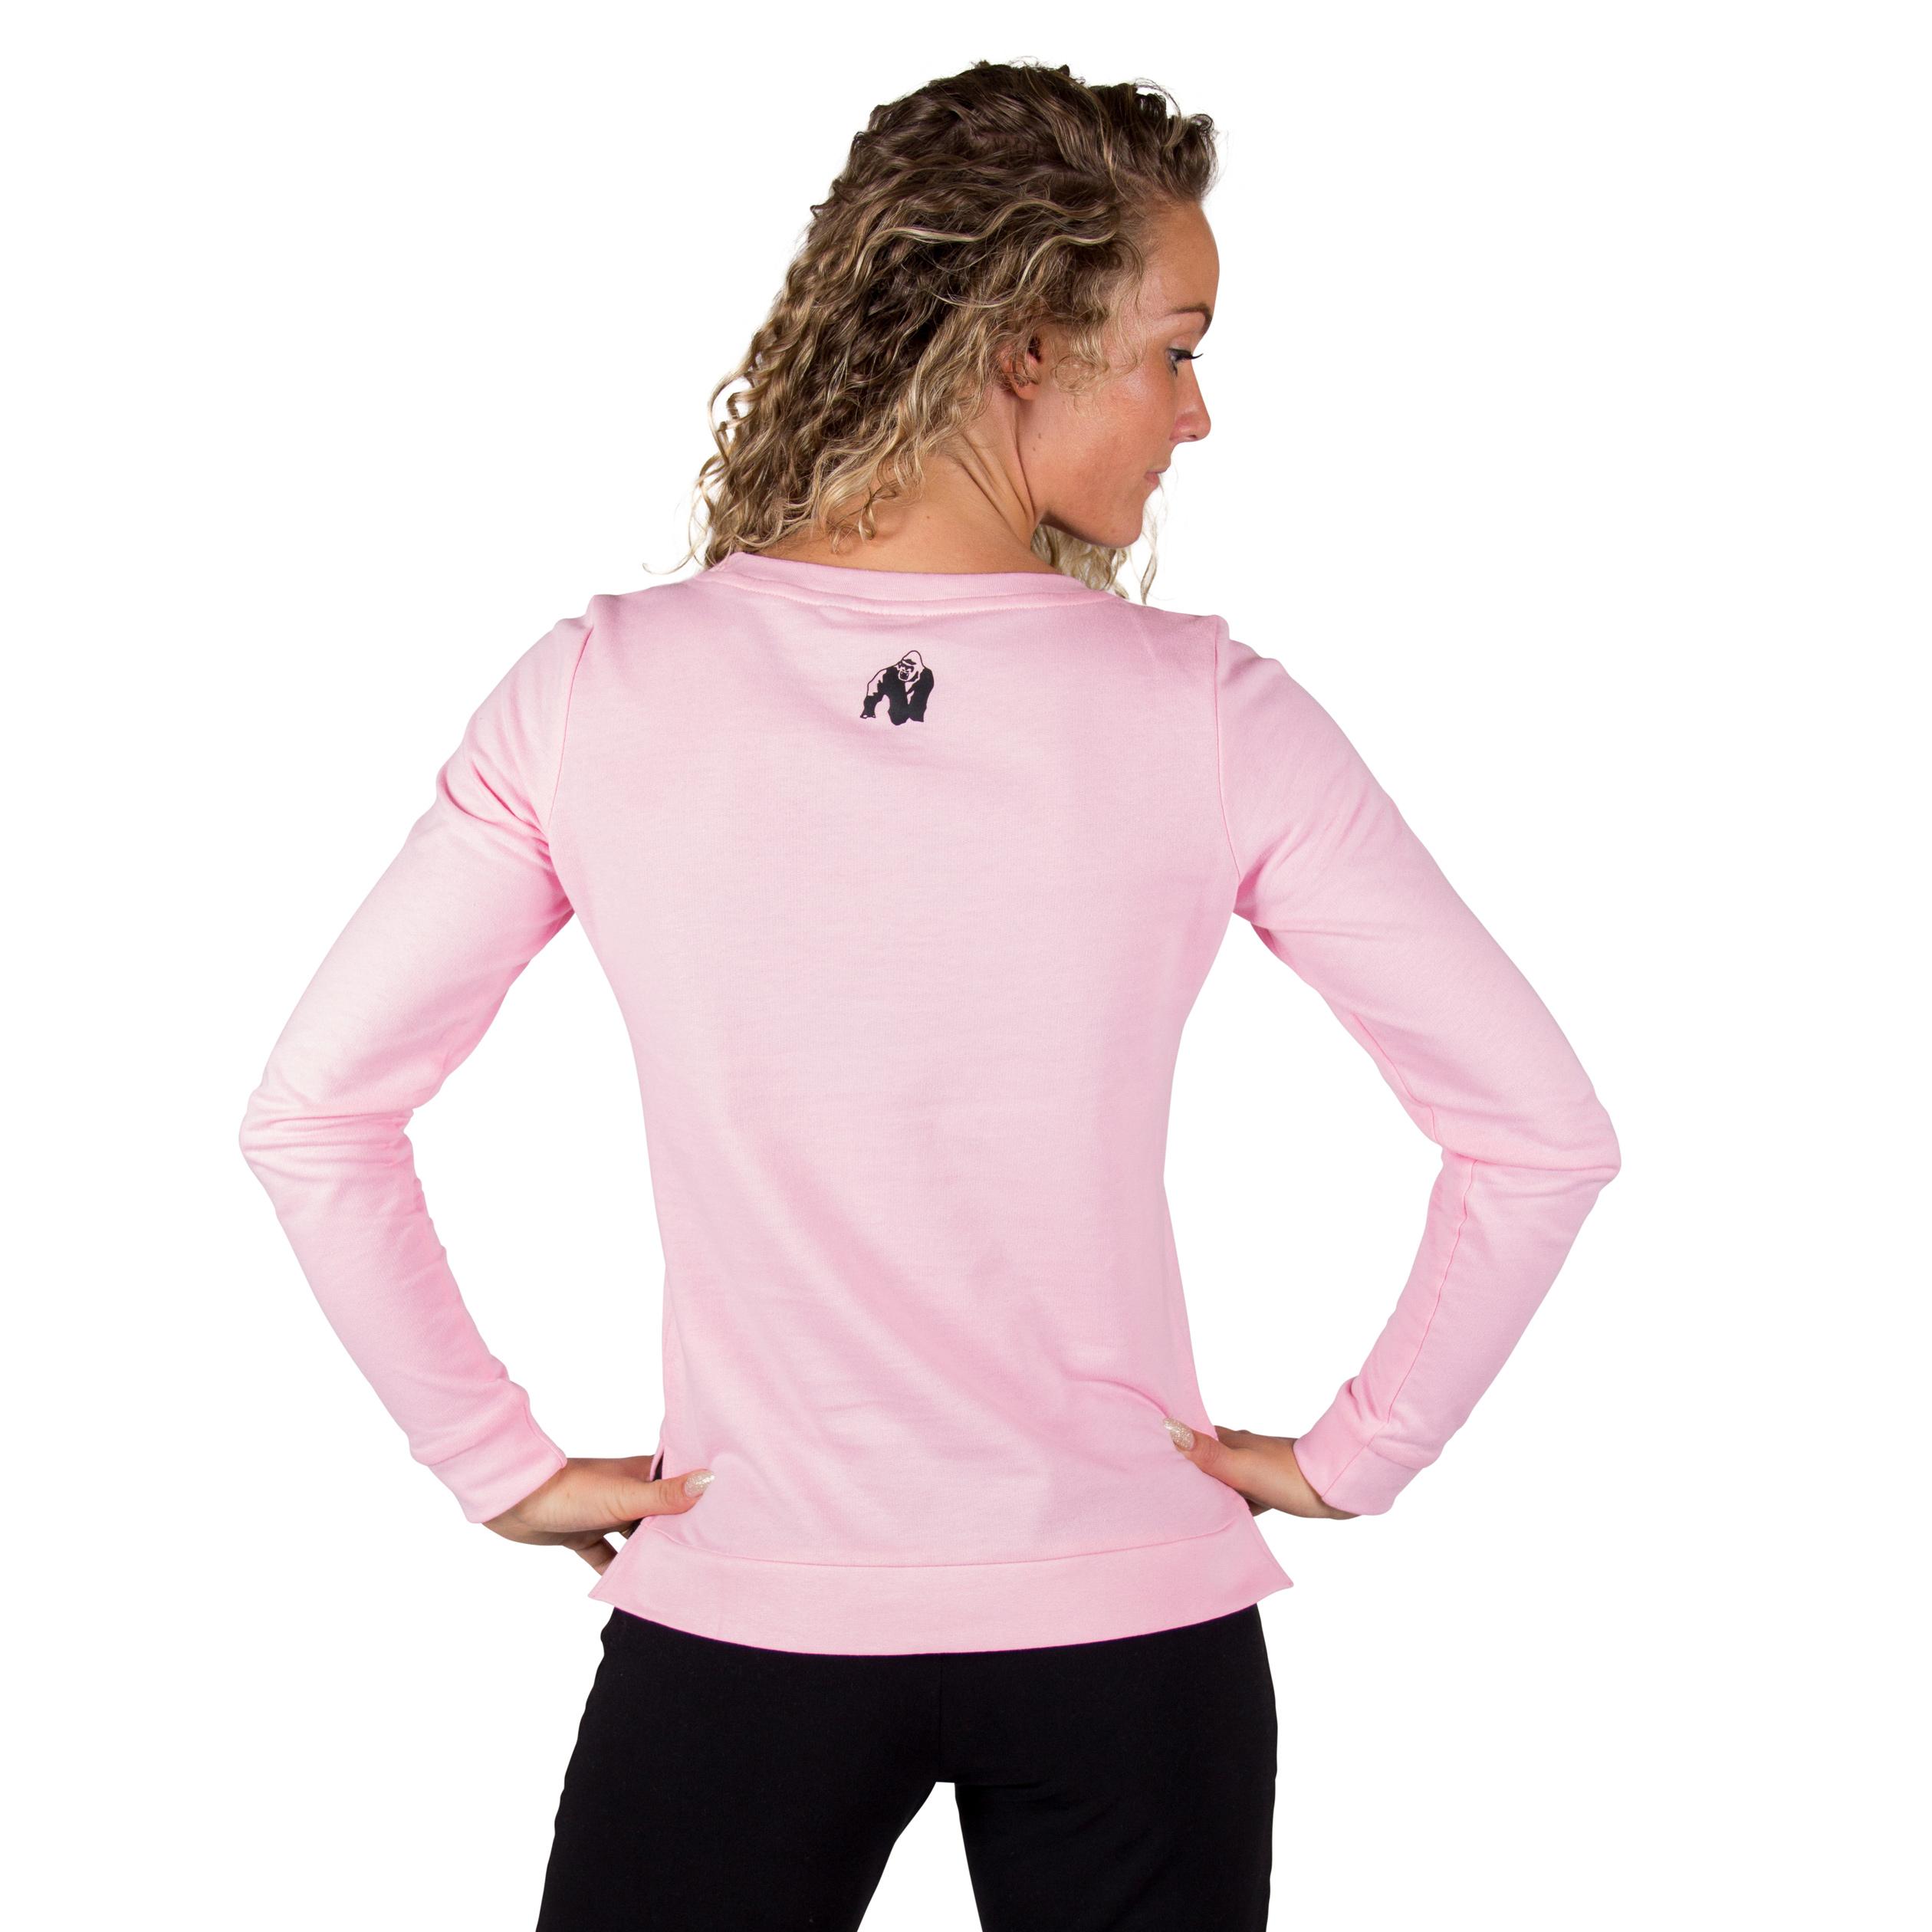 Dames Trui Roze.Fitness Trui Dames Riviera Roze Gorilla Wear Fitnesskledingshop Com